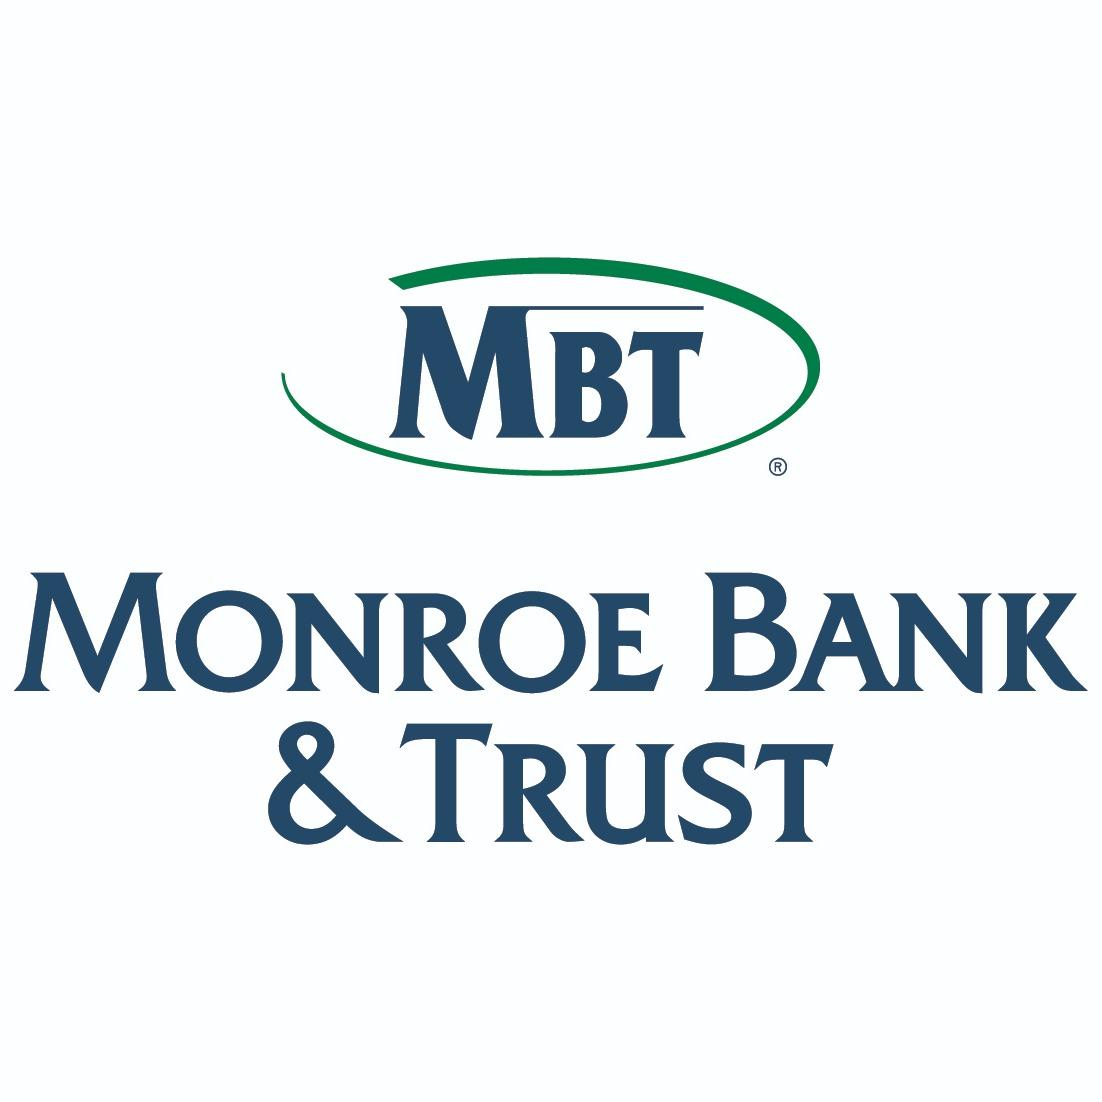 Monroe Bank Amp Trust Eureka Amp Fifth Loan And Wealth